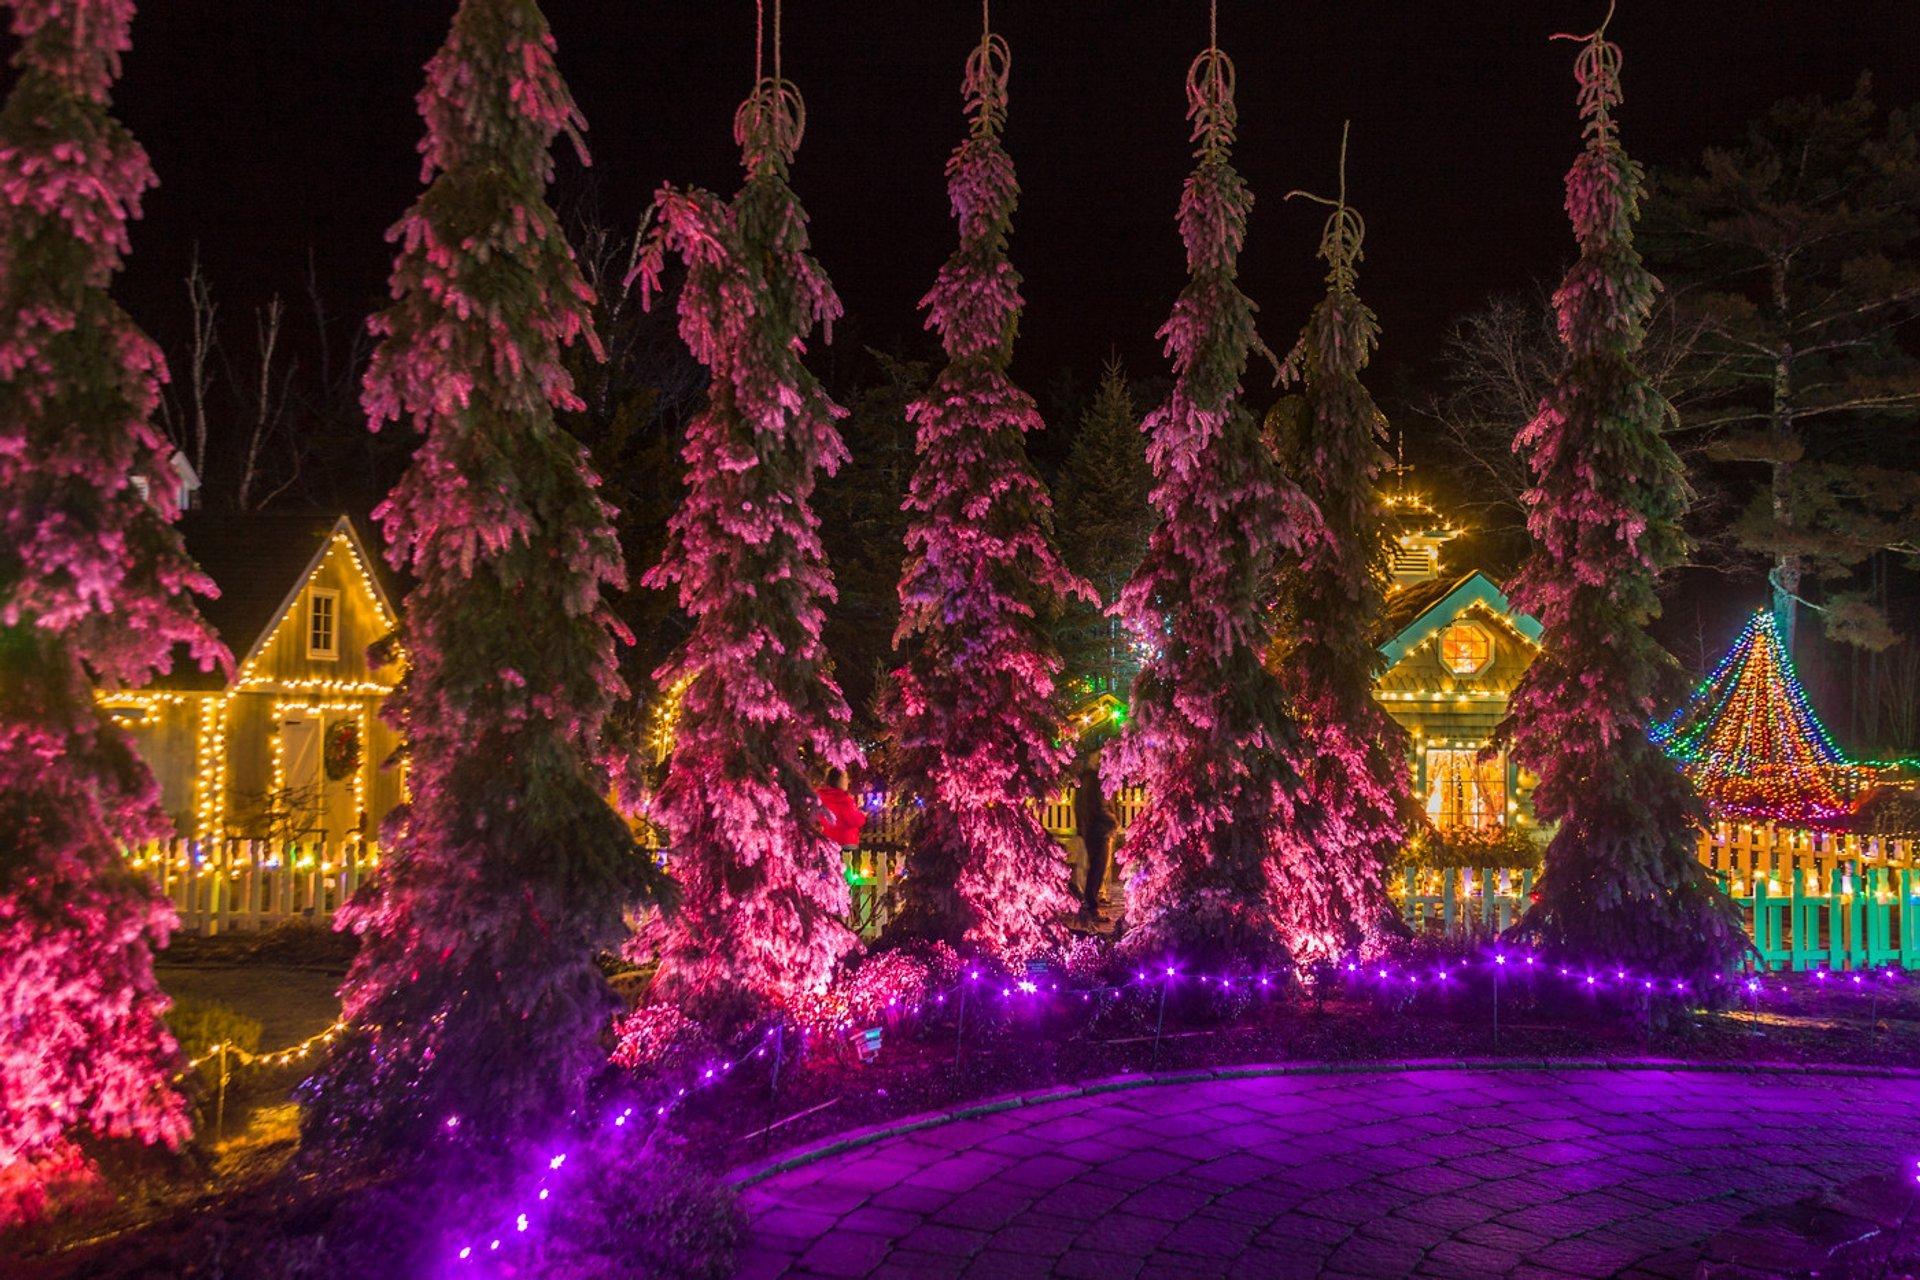 Freeport Christmas Lights 2020 Christmas Lights 2020 2021 in Maine   Dates